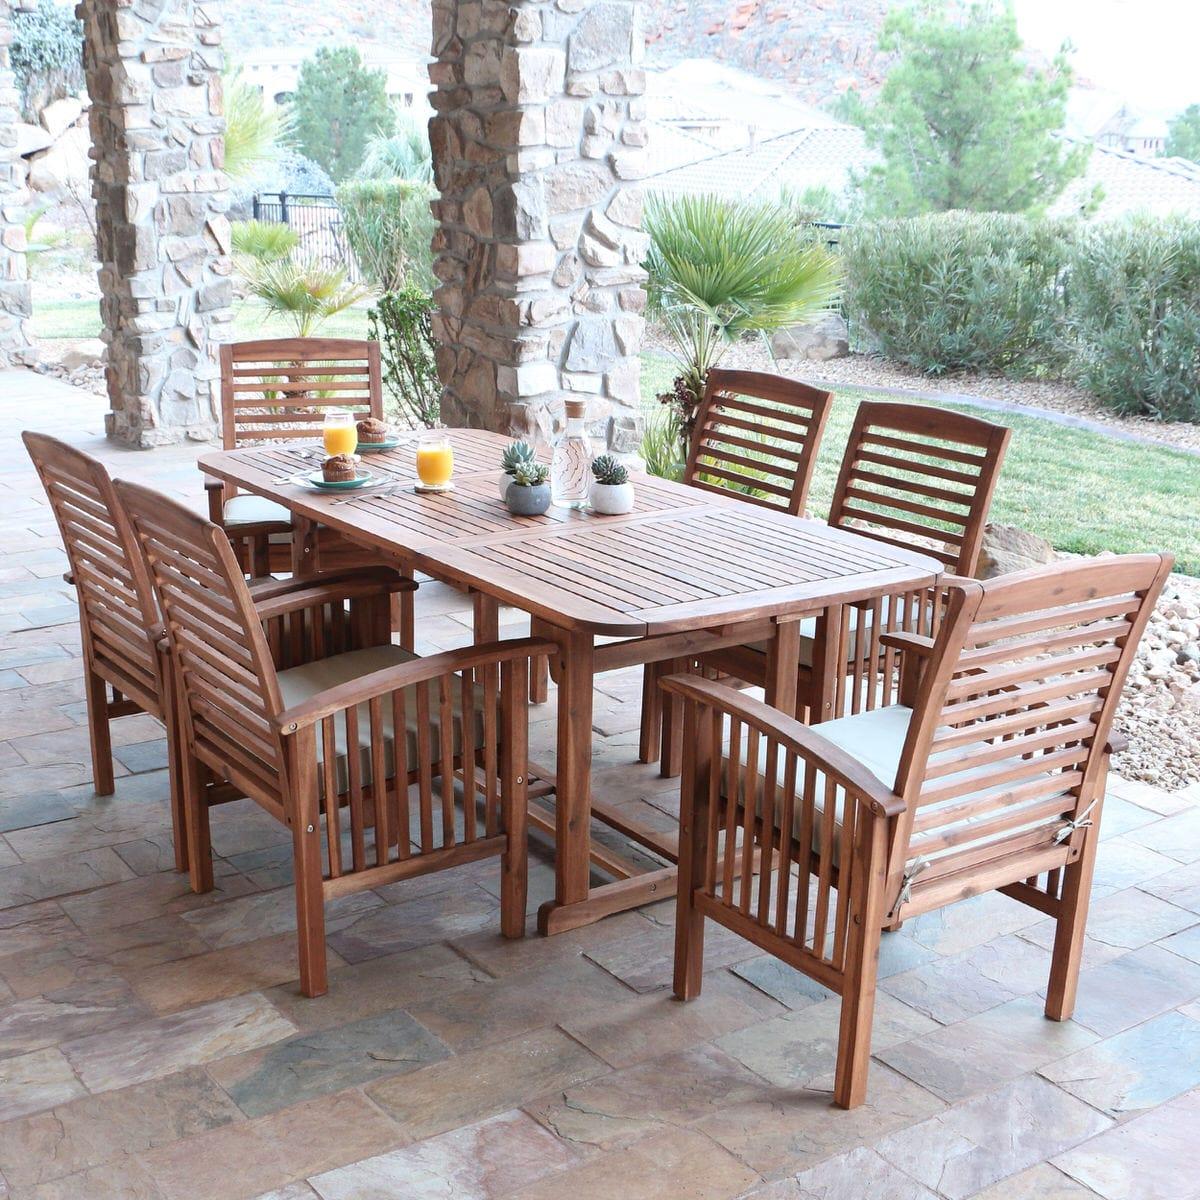 midland 7 piece acacia patio dining set w cushions brown by walker edison